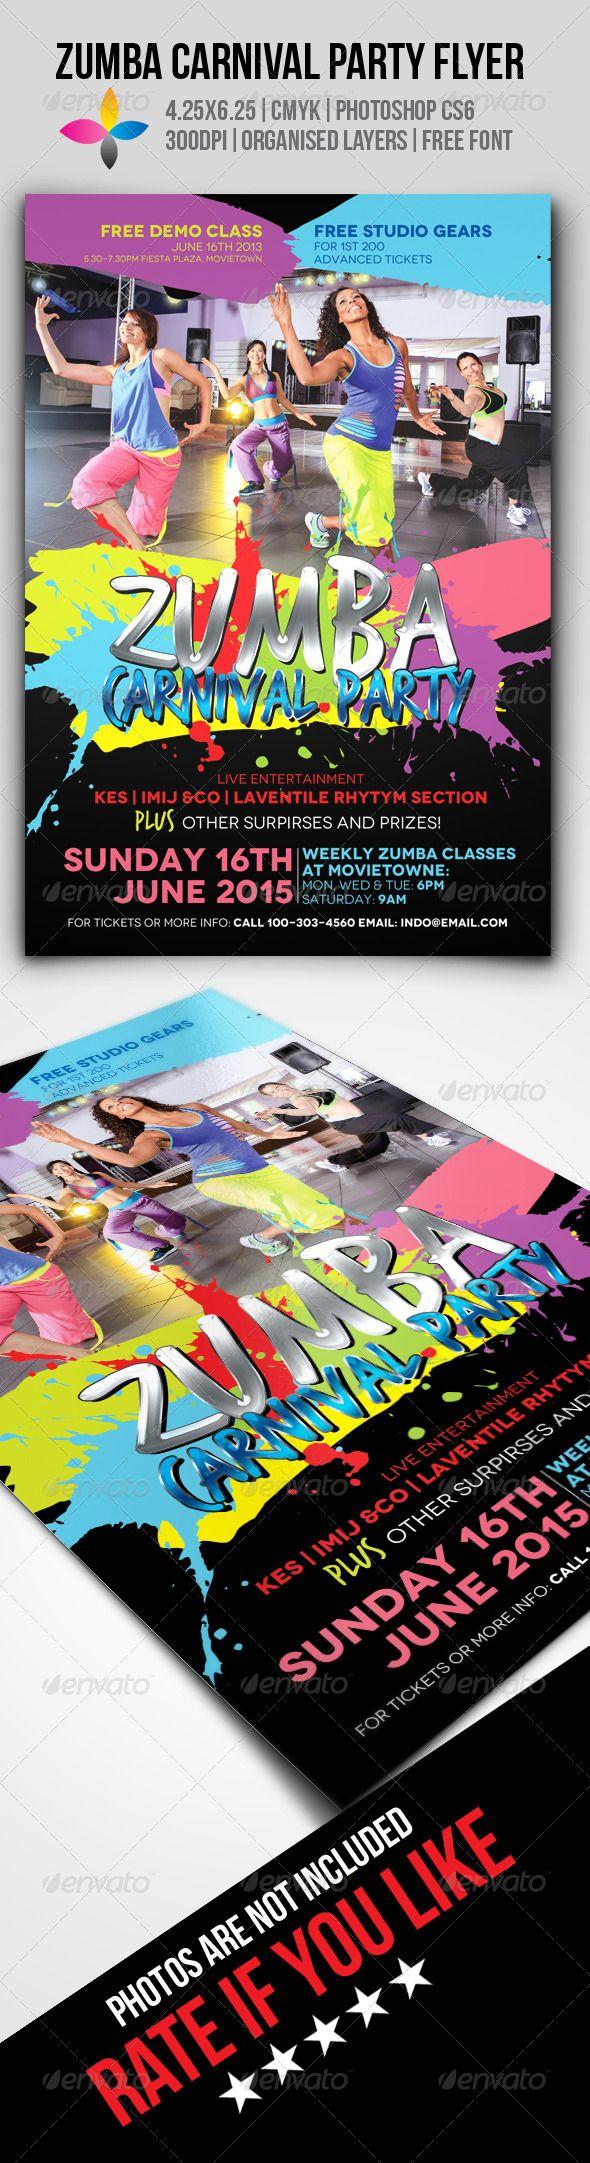 Zumba flyer design zumba flyers - Zumba Fitness Carnival Party Flyer